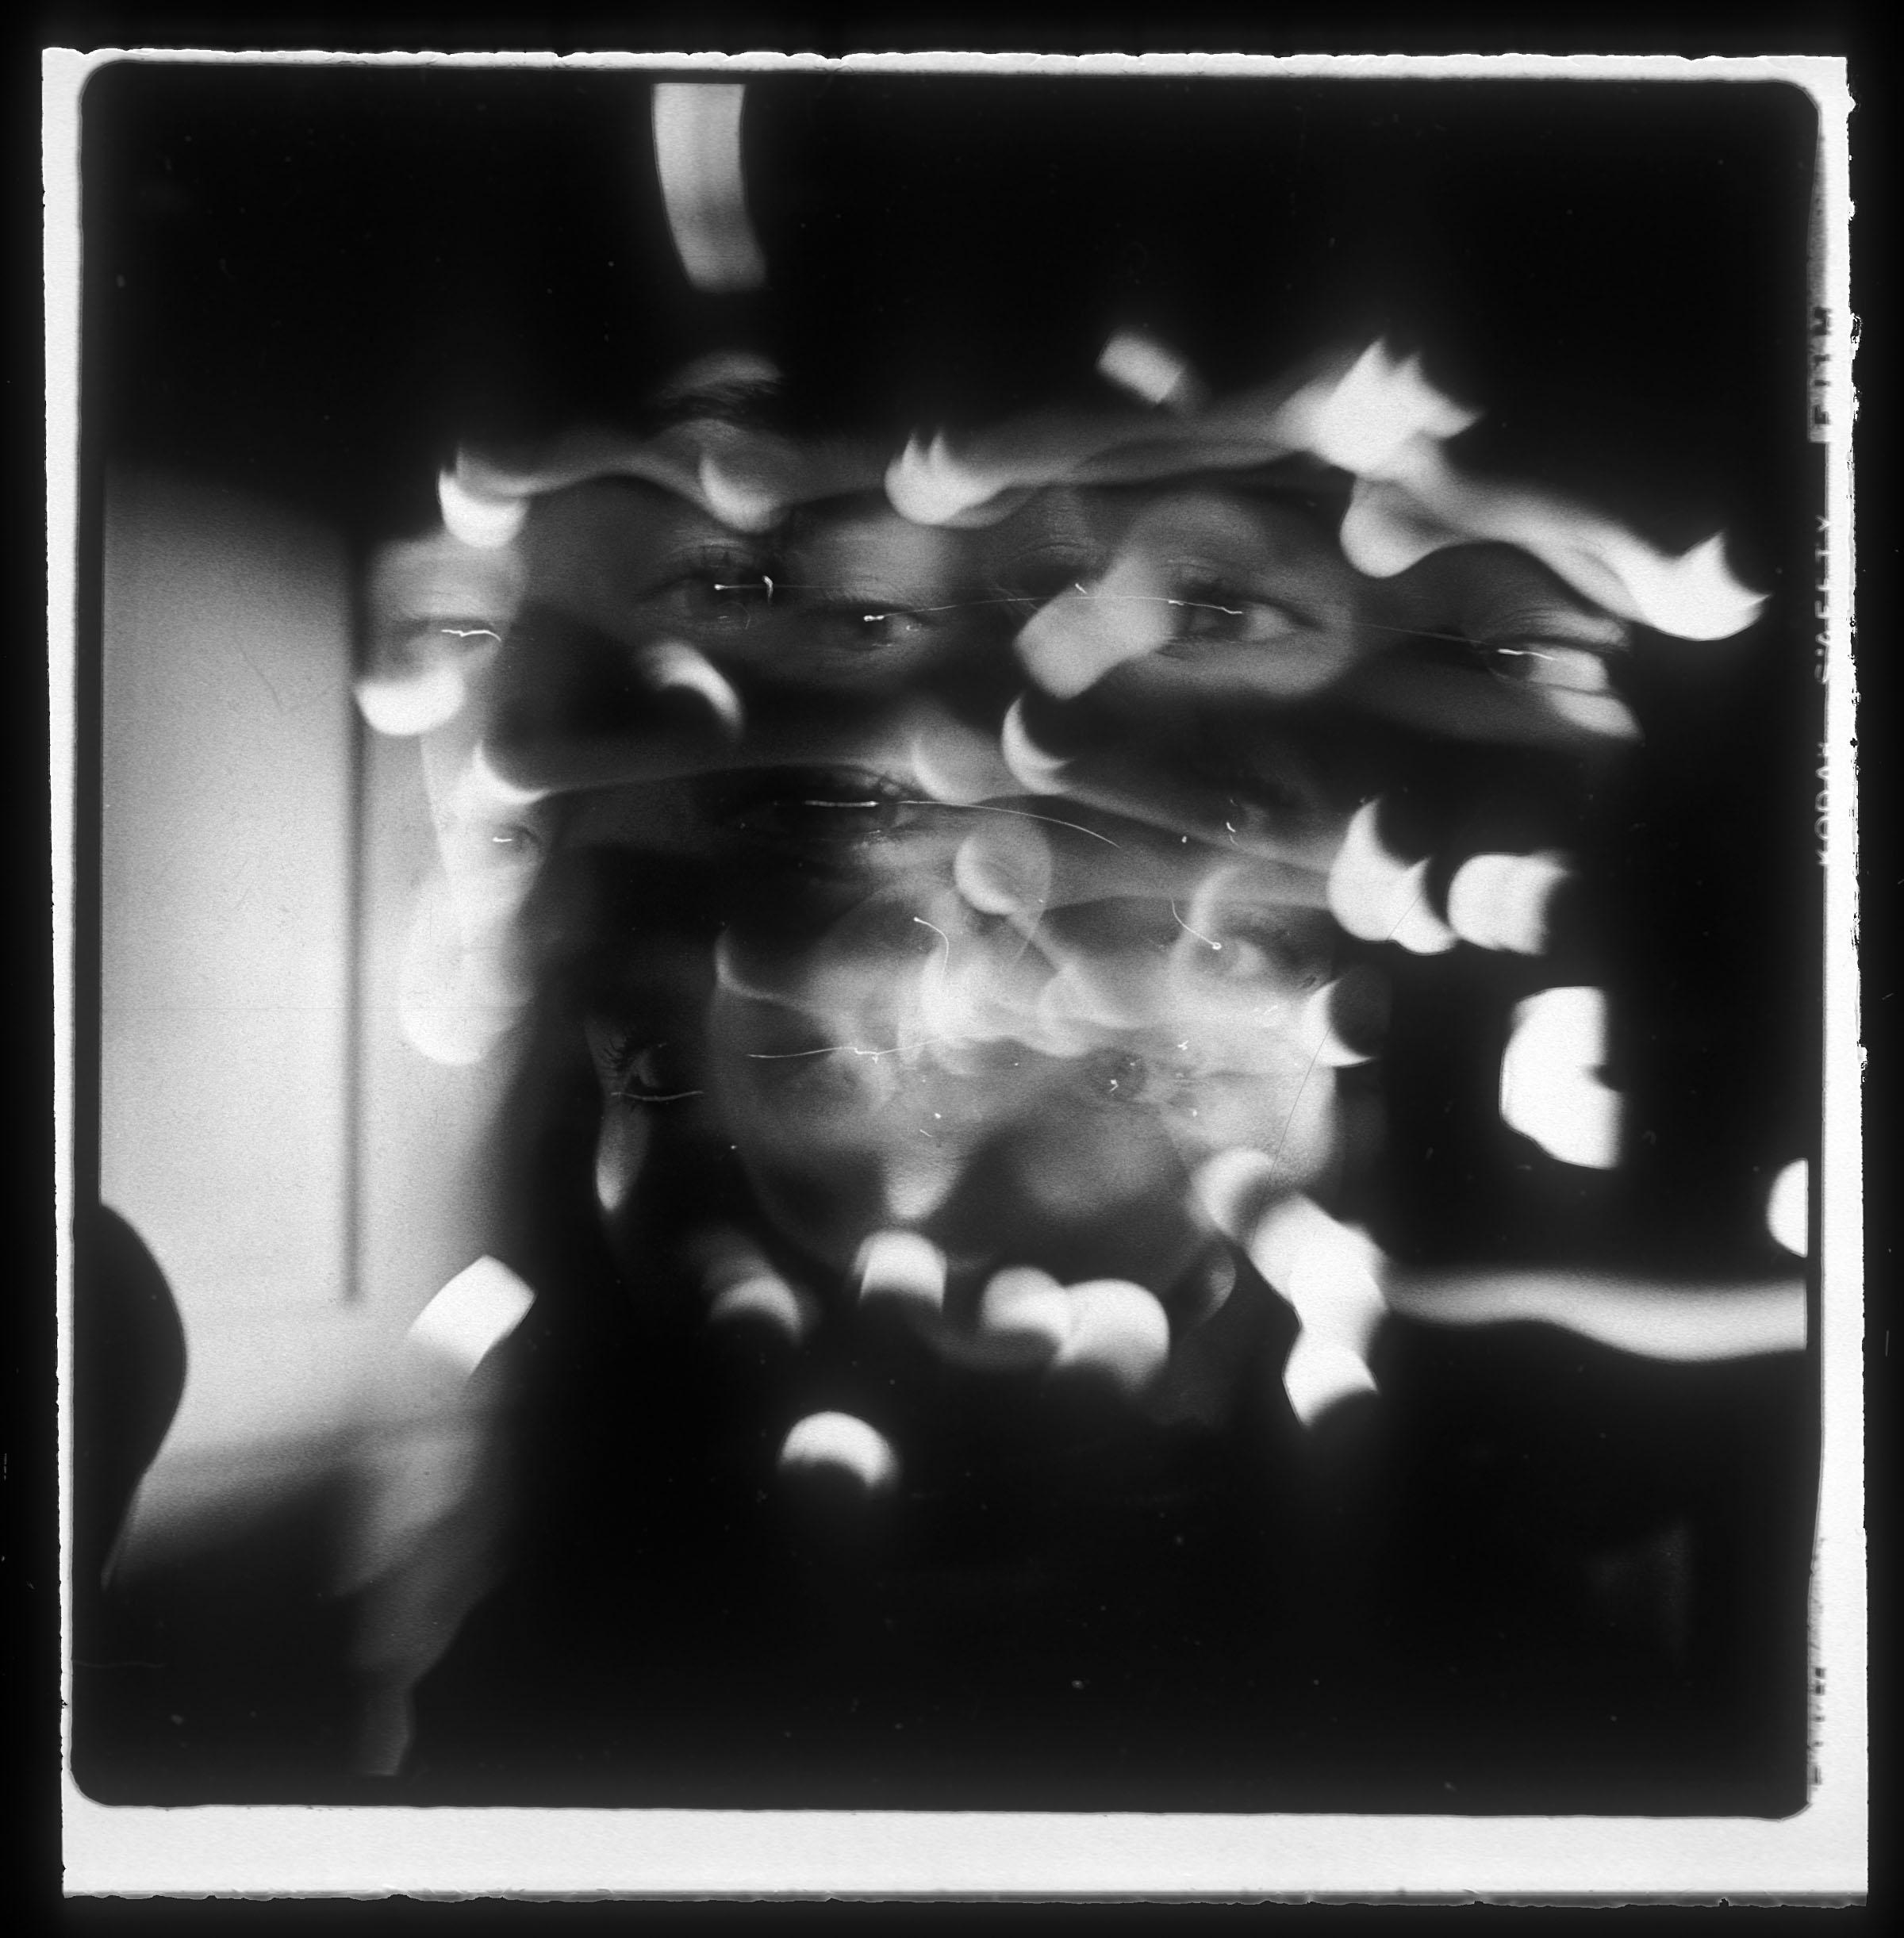 Ellen Carey, Light Portrait, 1976 ––